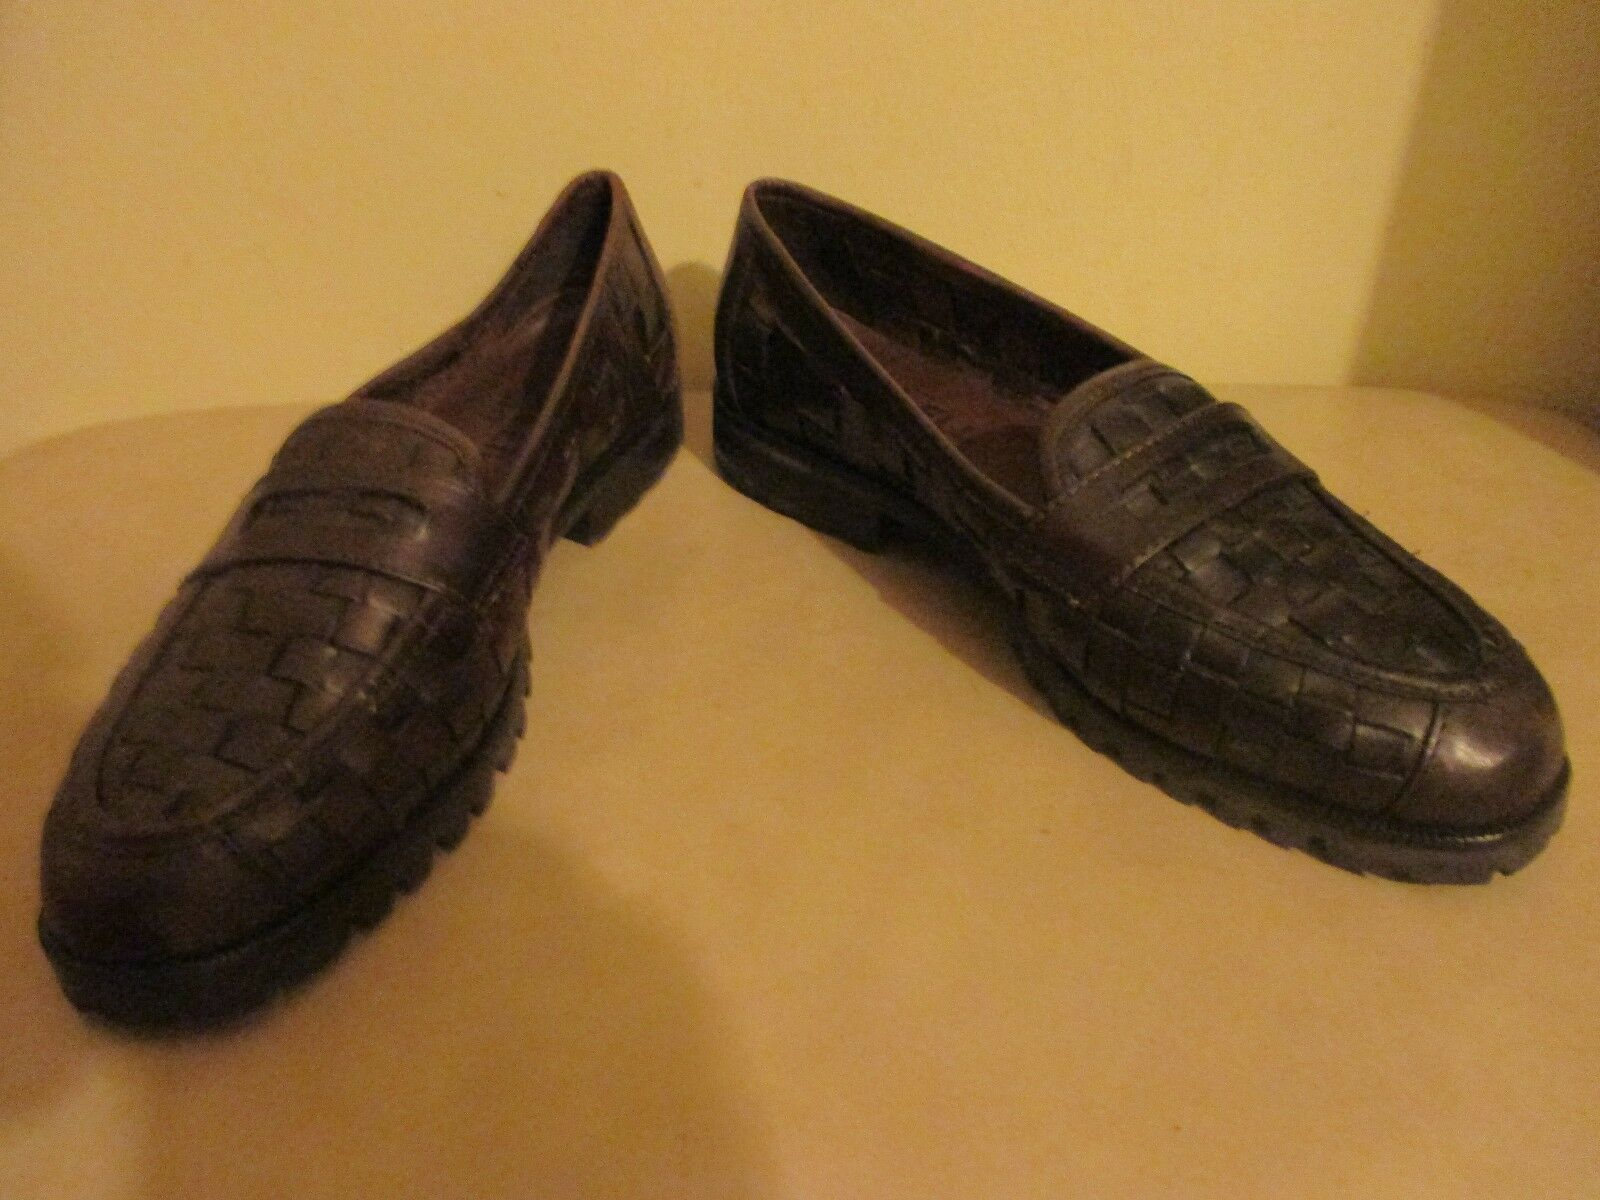 Van Eli Sport Dark Brown Basket Woven leather Penny loafer Slip On Size 7 N New